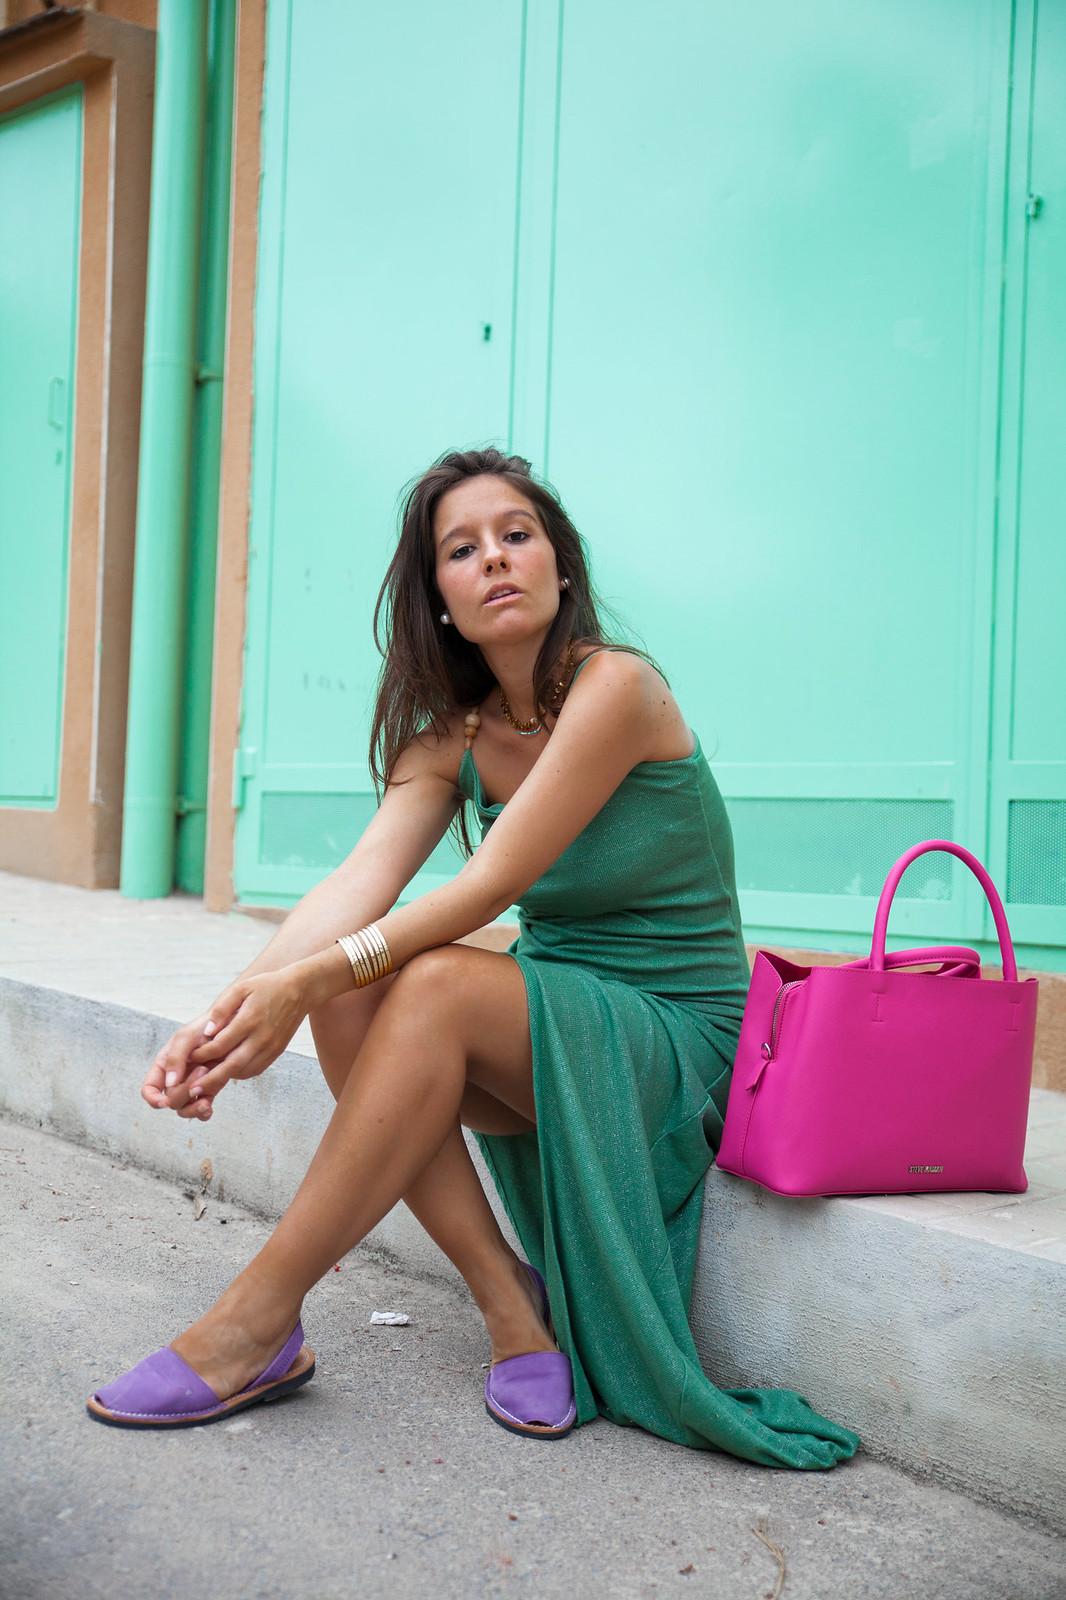 06_Vestido_turquesa_largo_outfit_embarazada_influencer_barcelona_theguestgirl